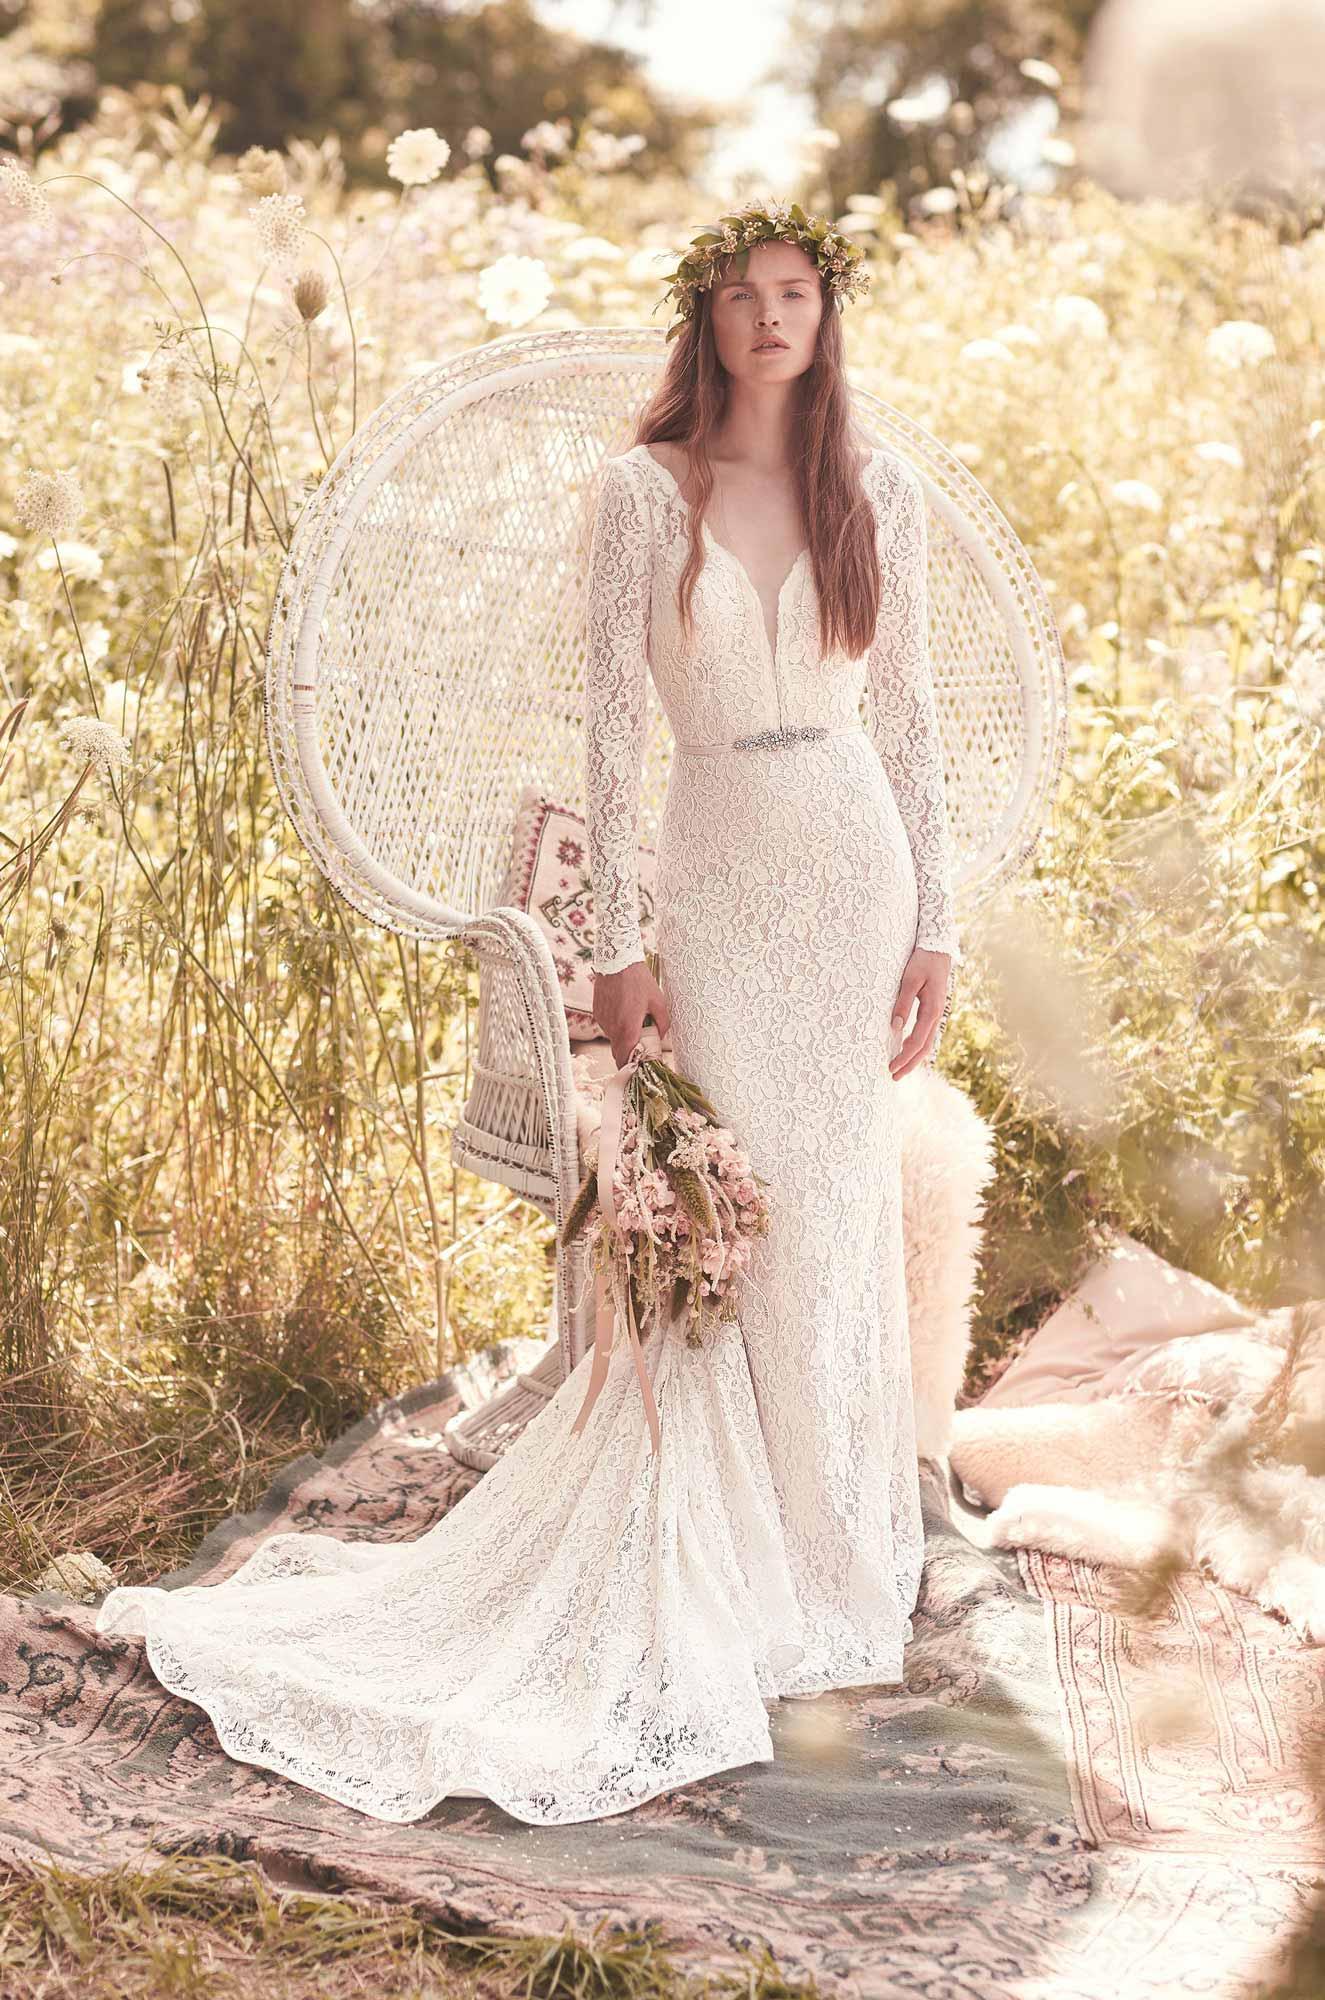 Indulging Long Sleeve Wedding Dress Style Mikaella Bridal Long Sleeve Wedding Dress Long S Long Sleeve Wedding Dress Under 300 wedding dress Long Sleeve Wedding Dress